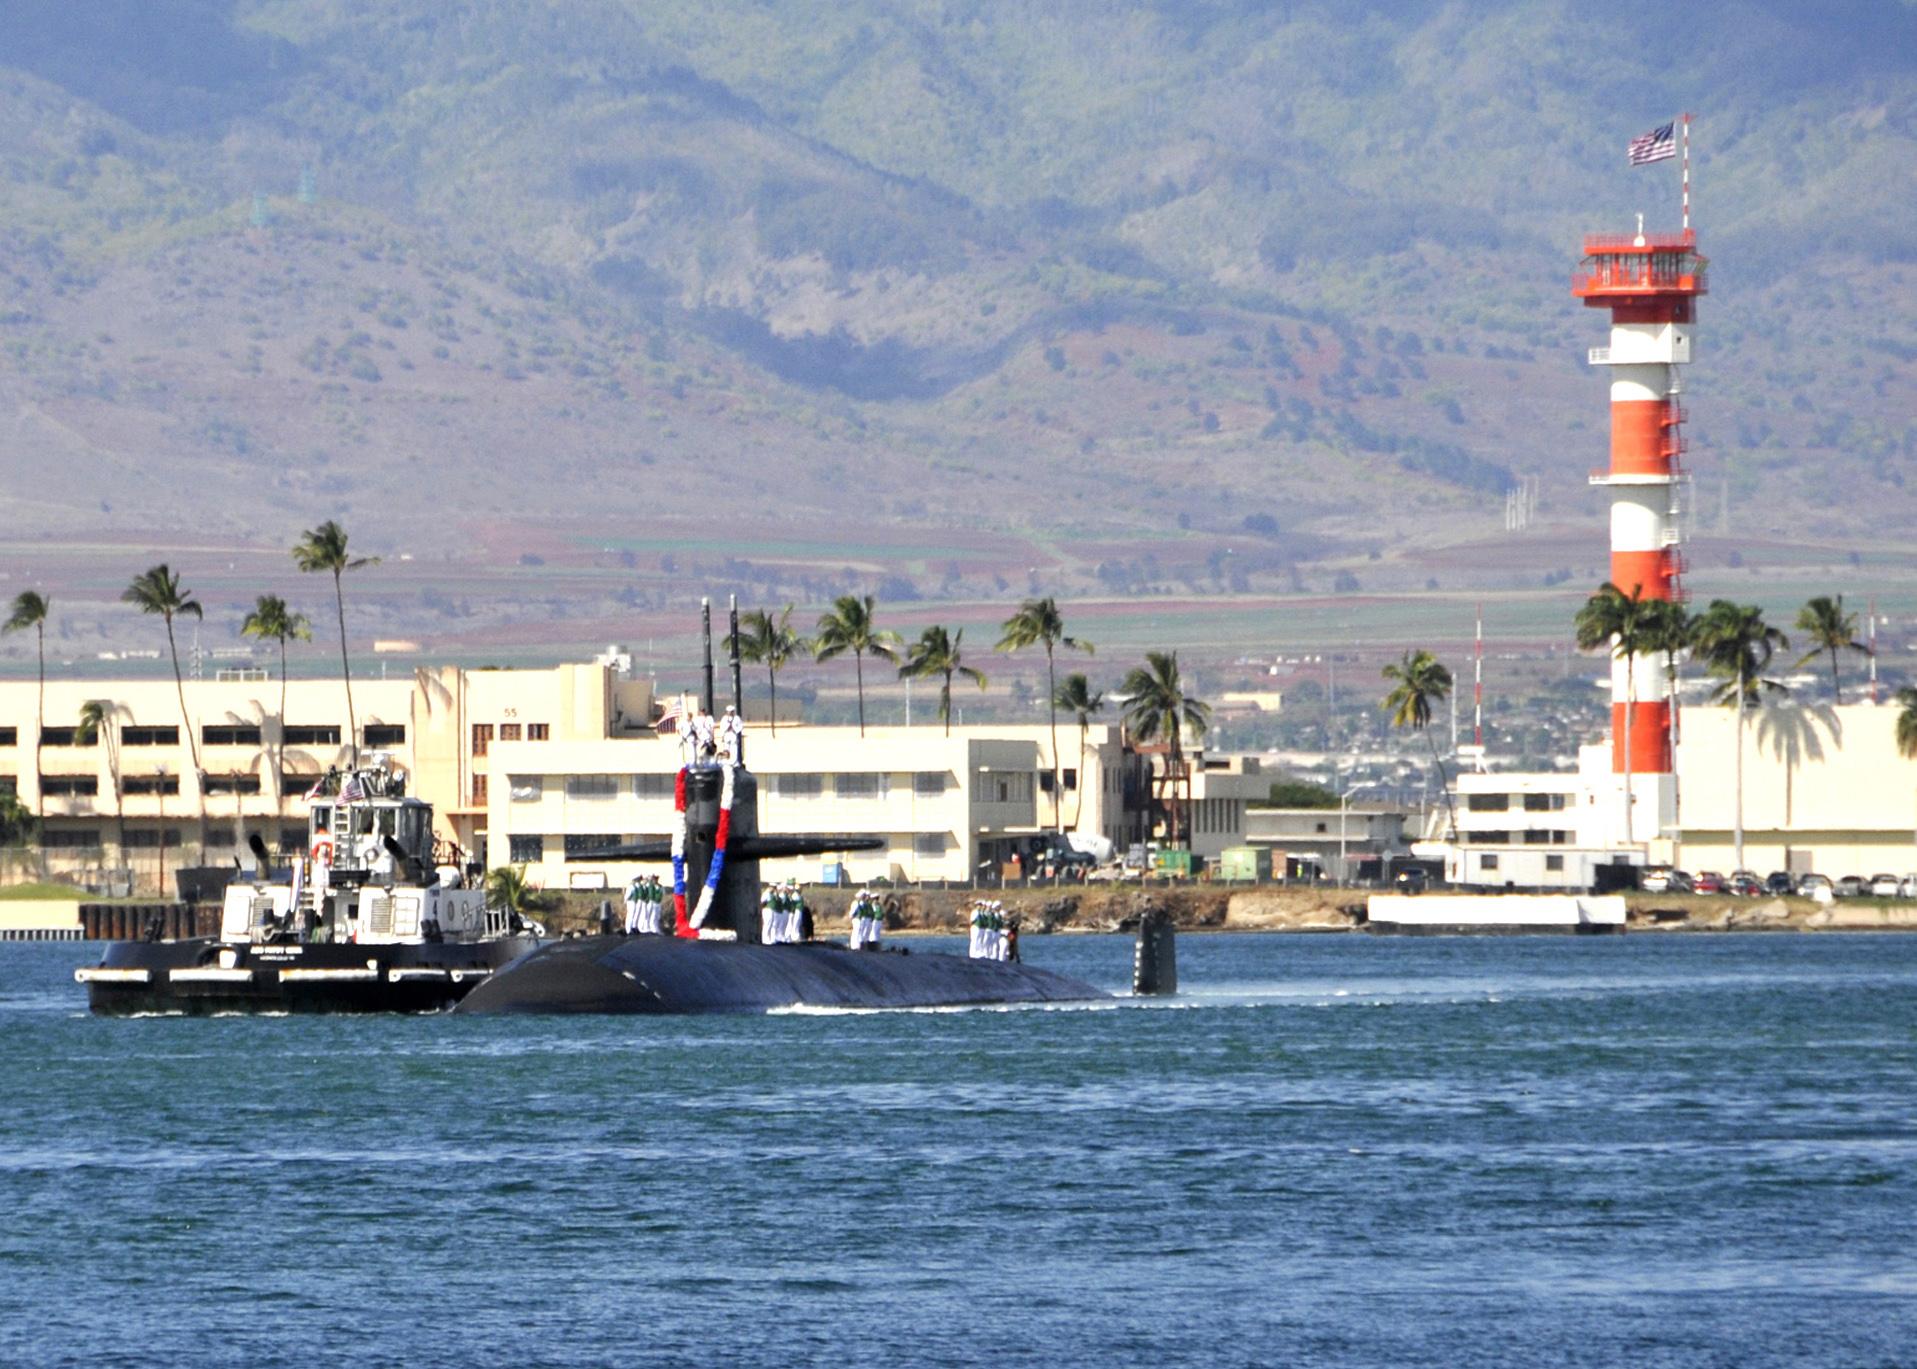 Uss Buffalo Welcomed To New Homeport With Aloha